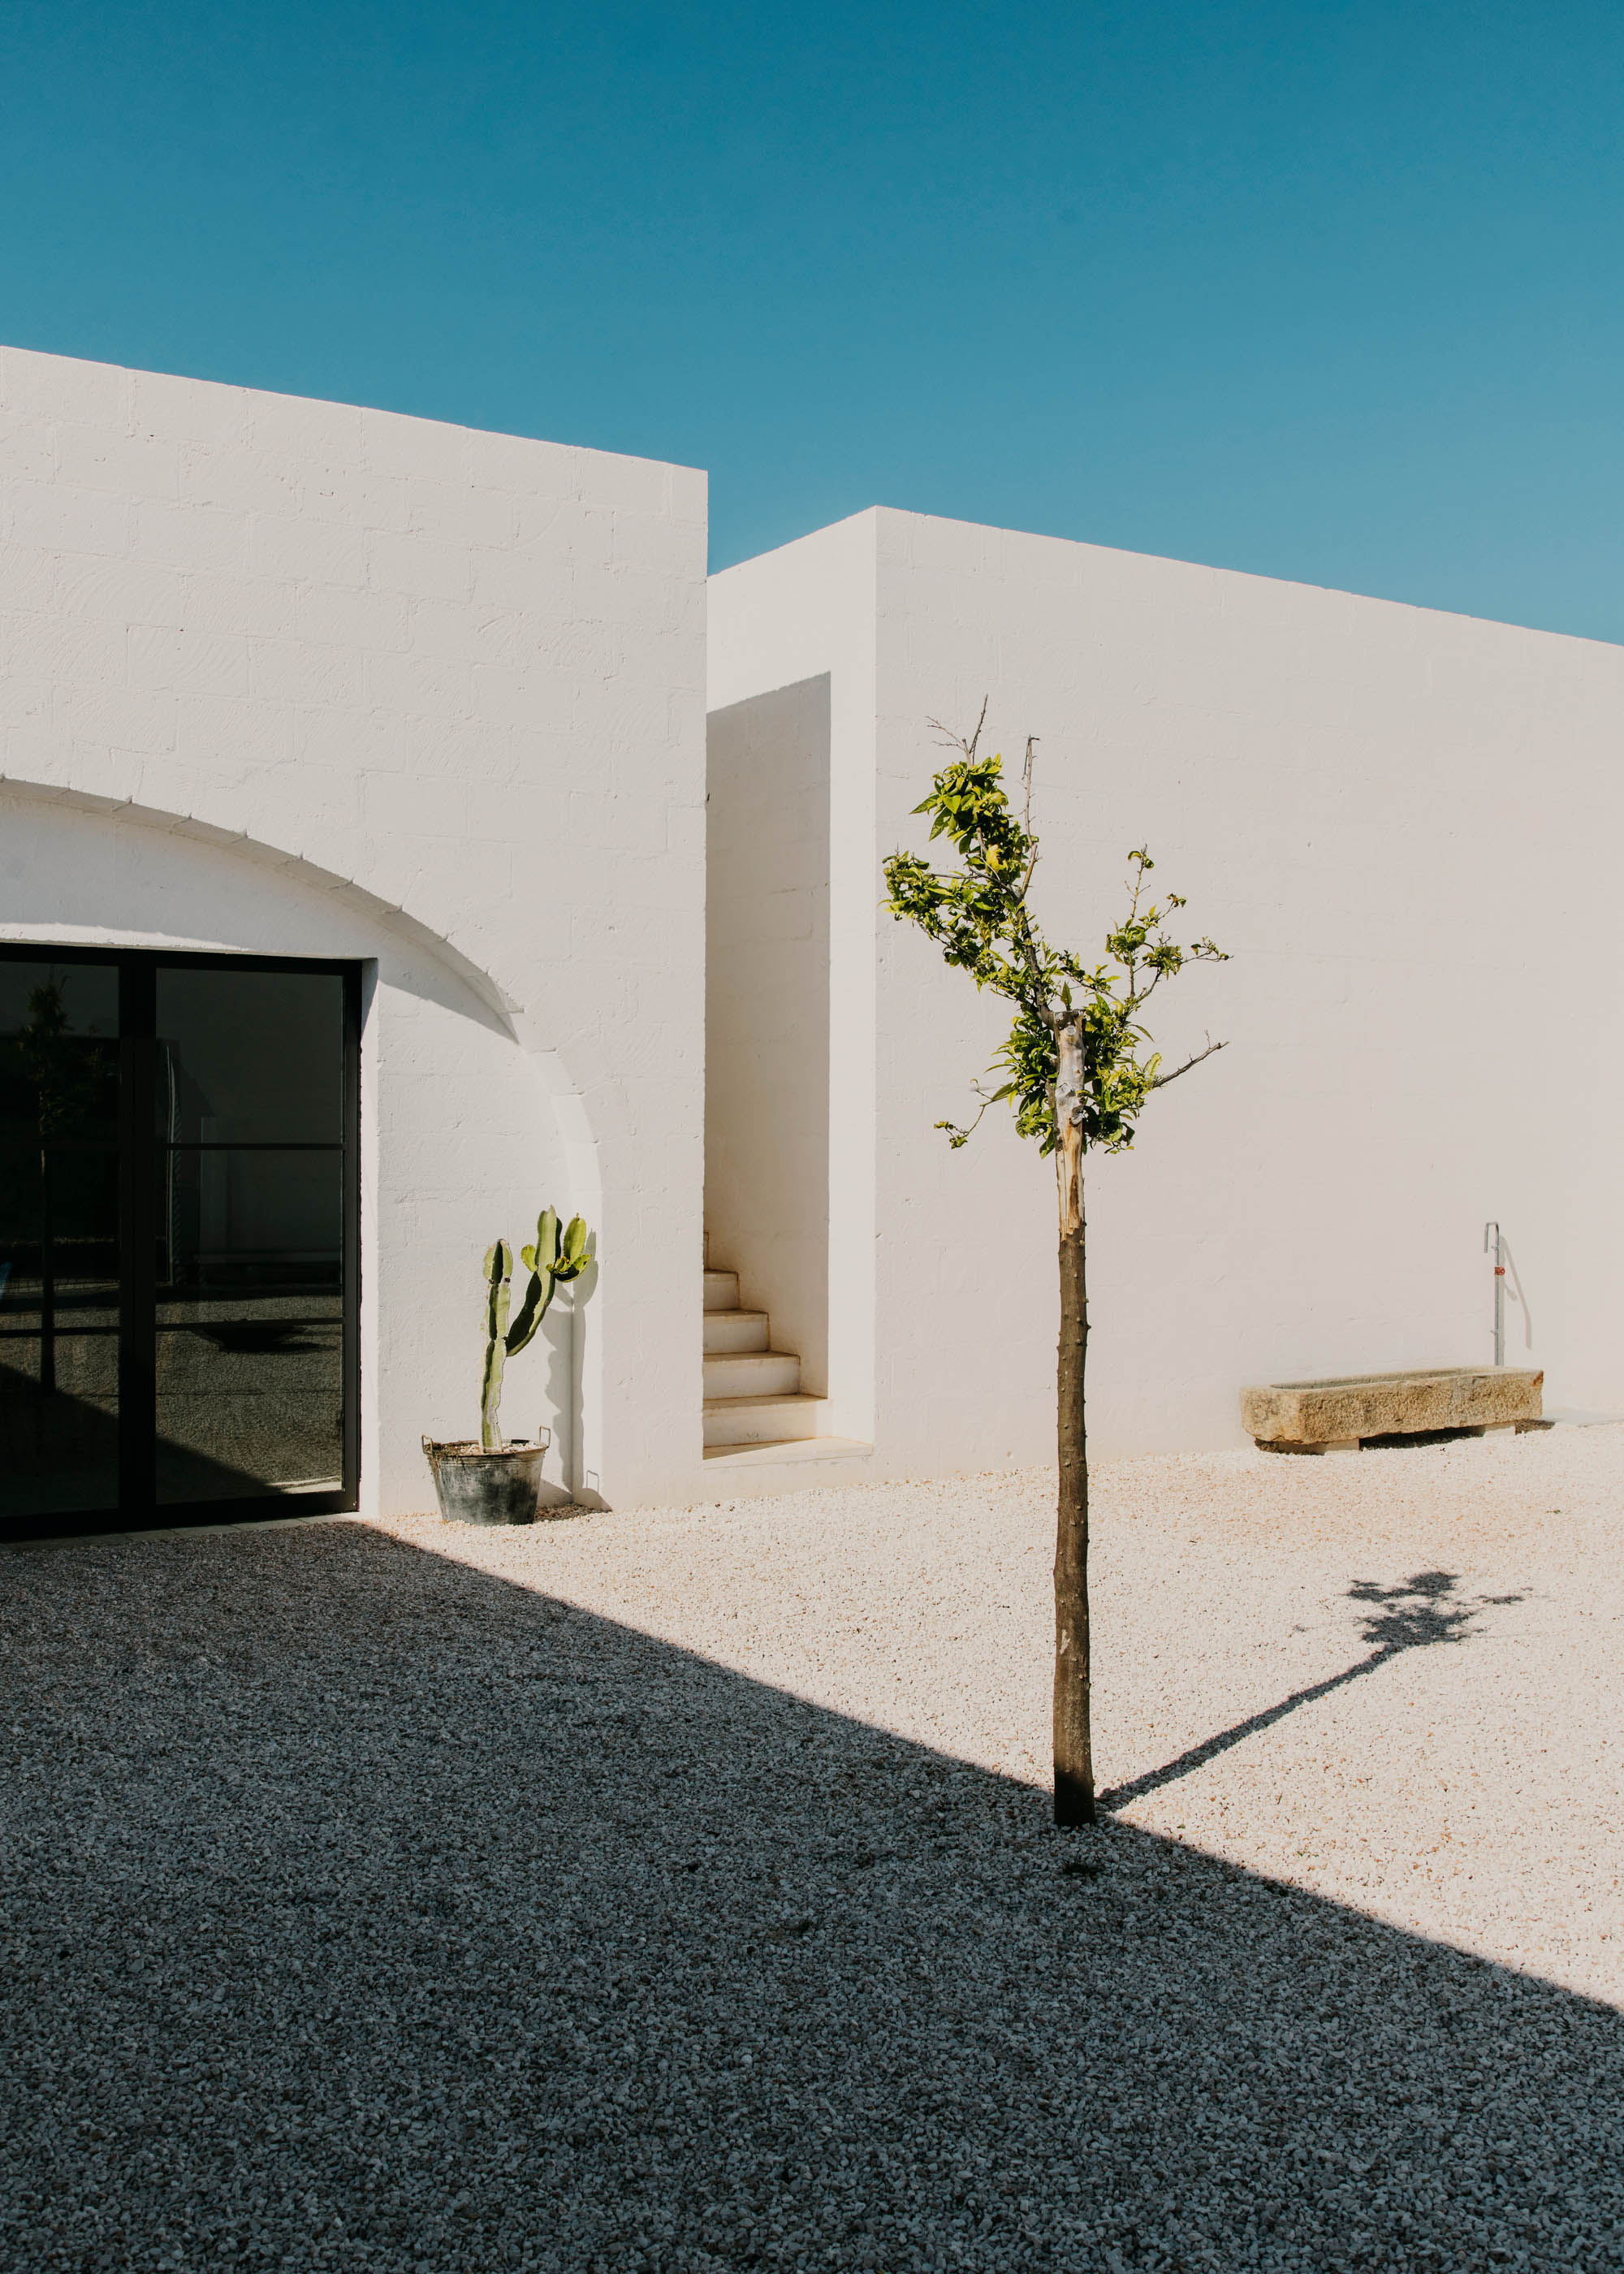 #editorial #italy #puglia #masseria #morosseta #openhouse #architecture #hotels